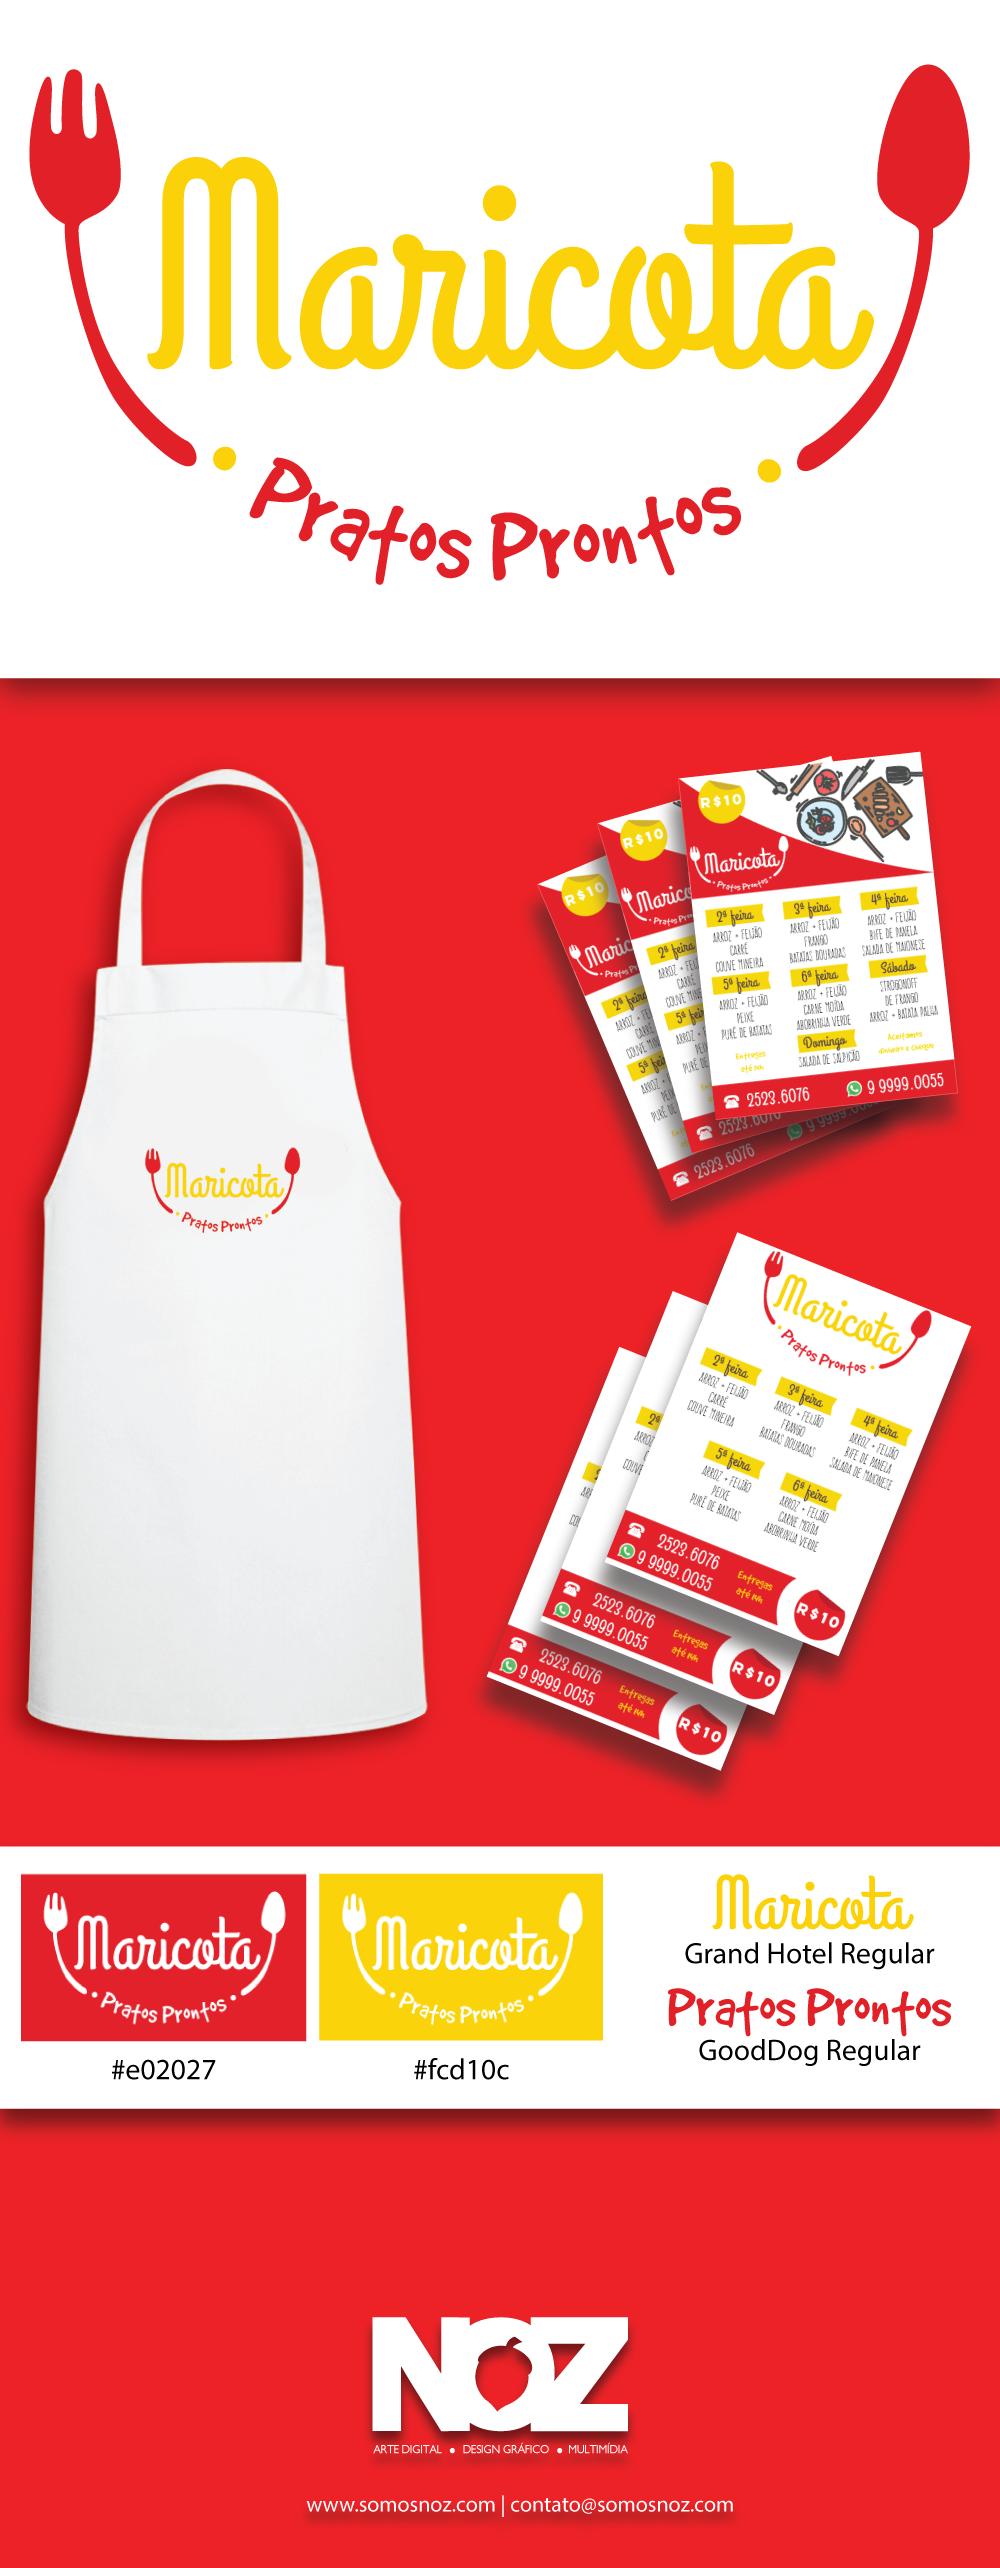 felipe freitas logo design flyer layout design